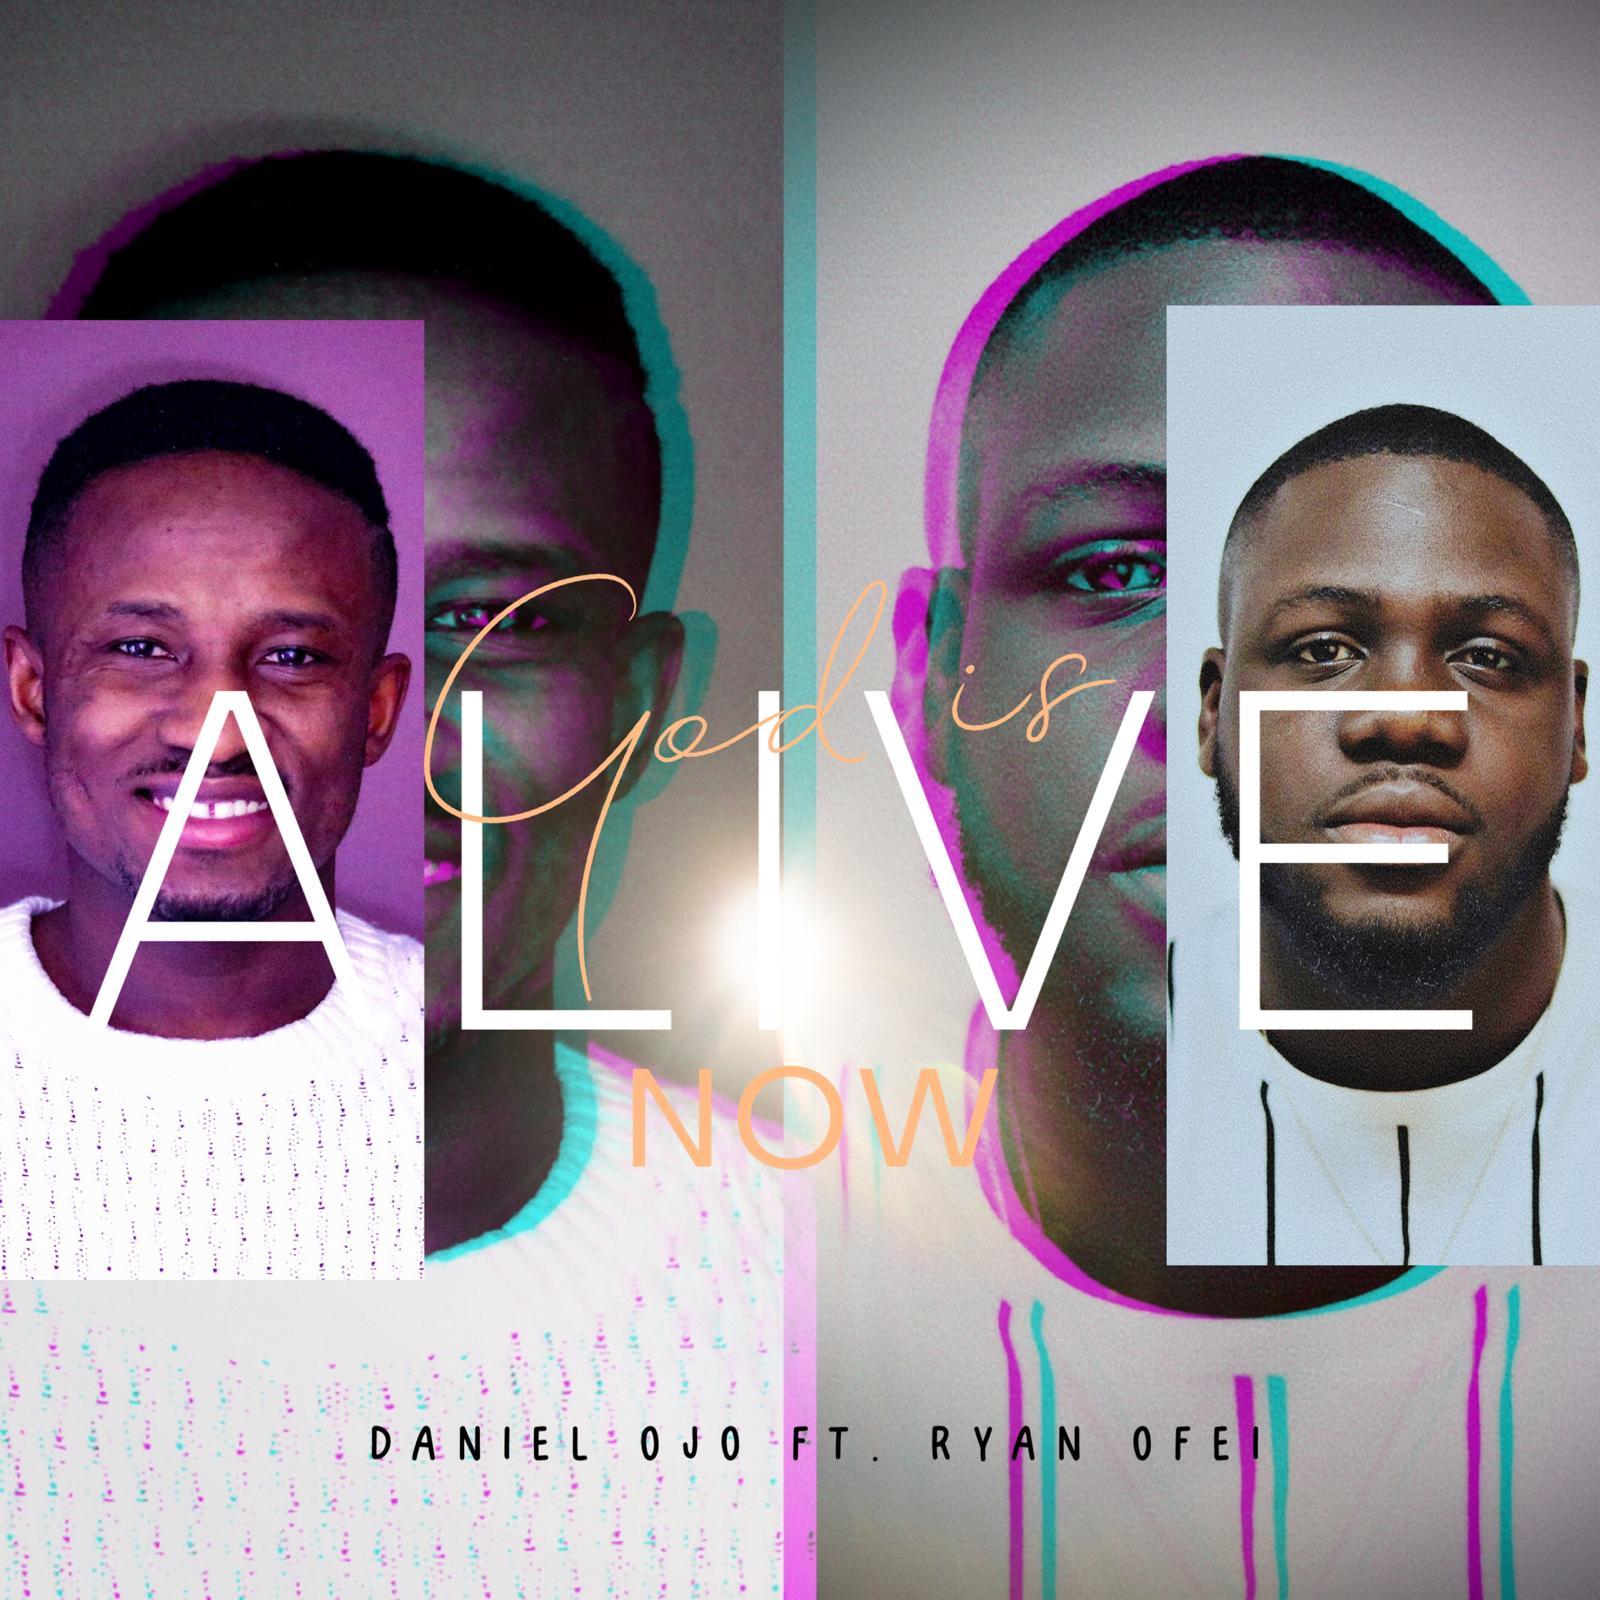 Daniel Ojo God Is Alive Now (Ft. Ryan Ofei Richrok)